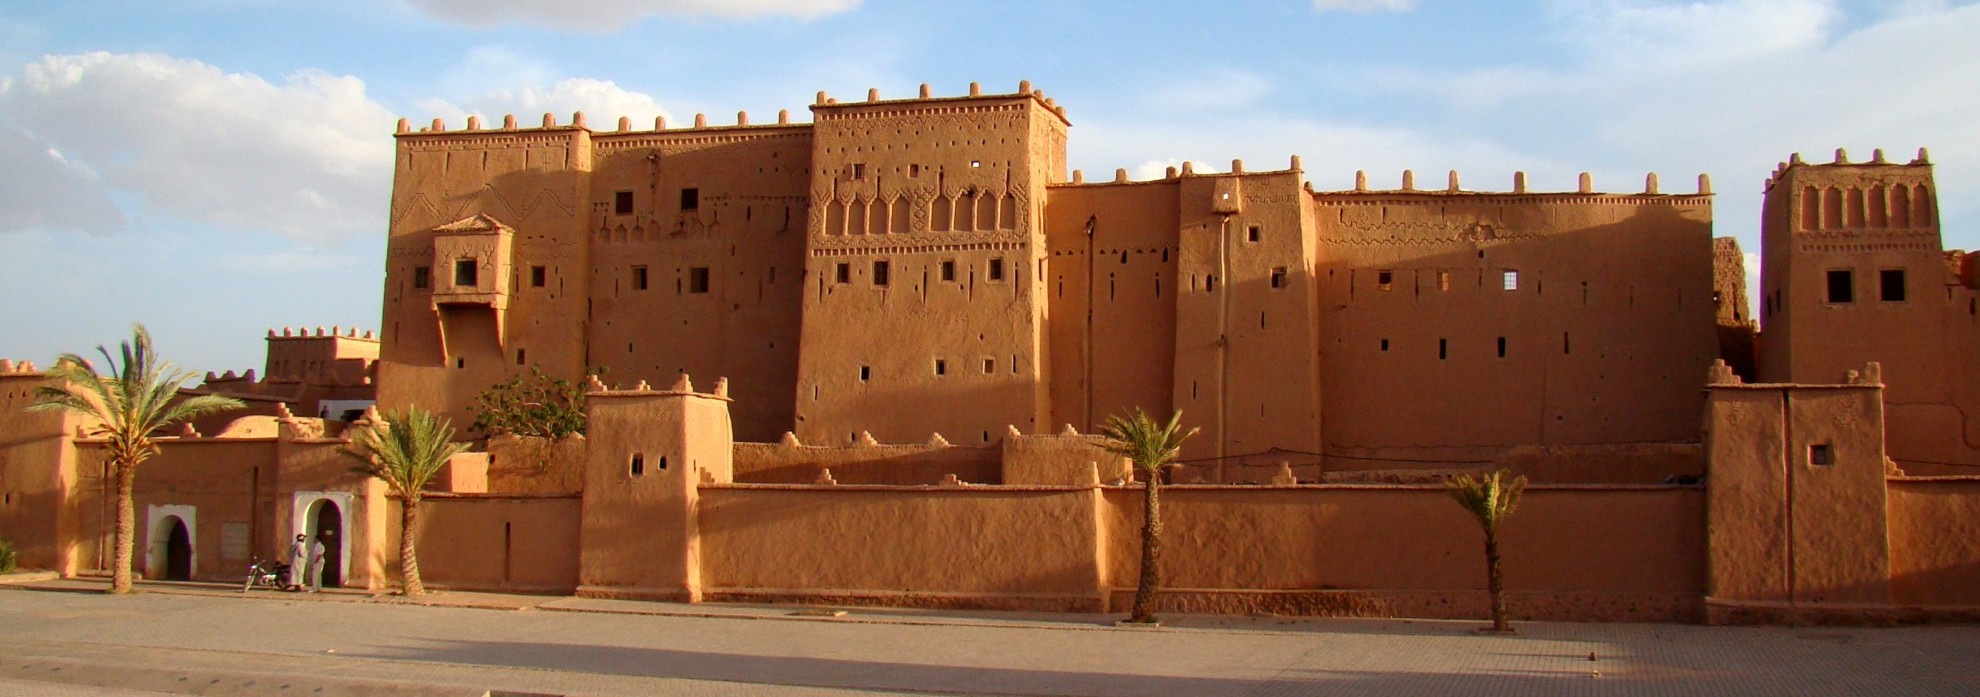 Kasbah_Taourirt_in_Ouarzazate_2011-e1411913988926